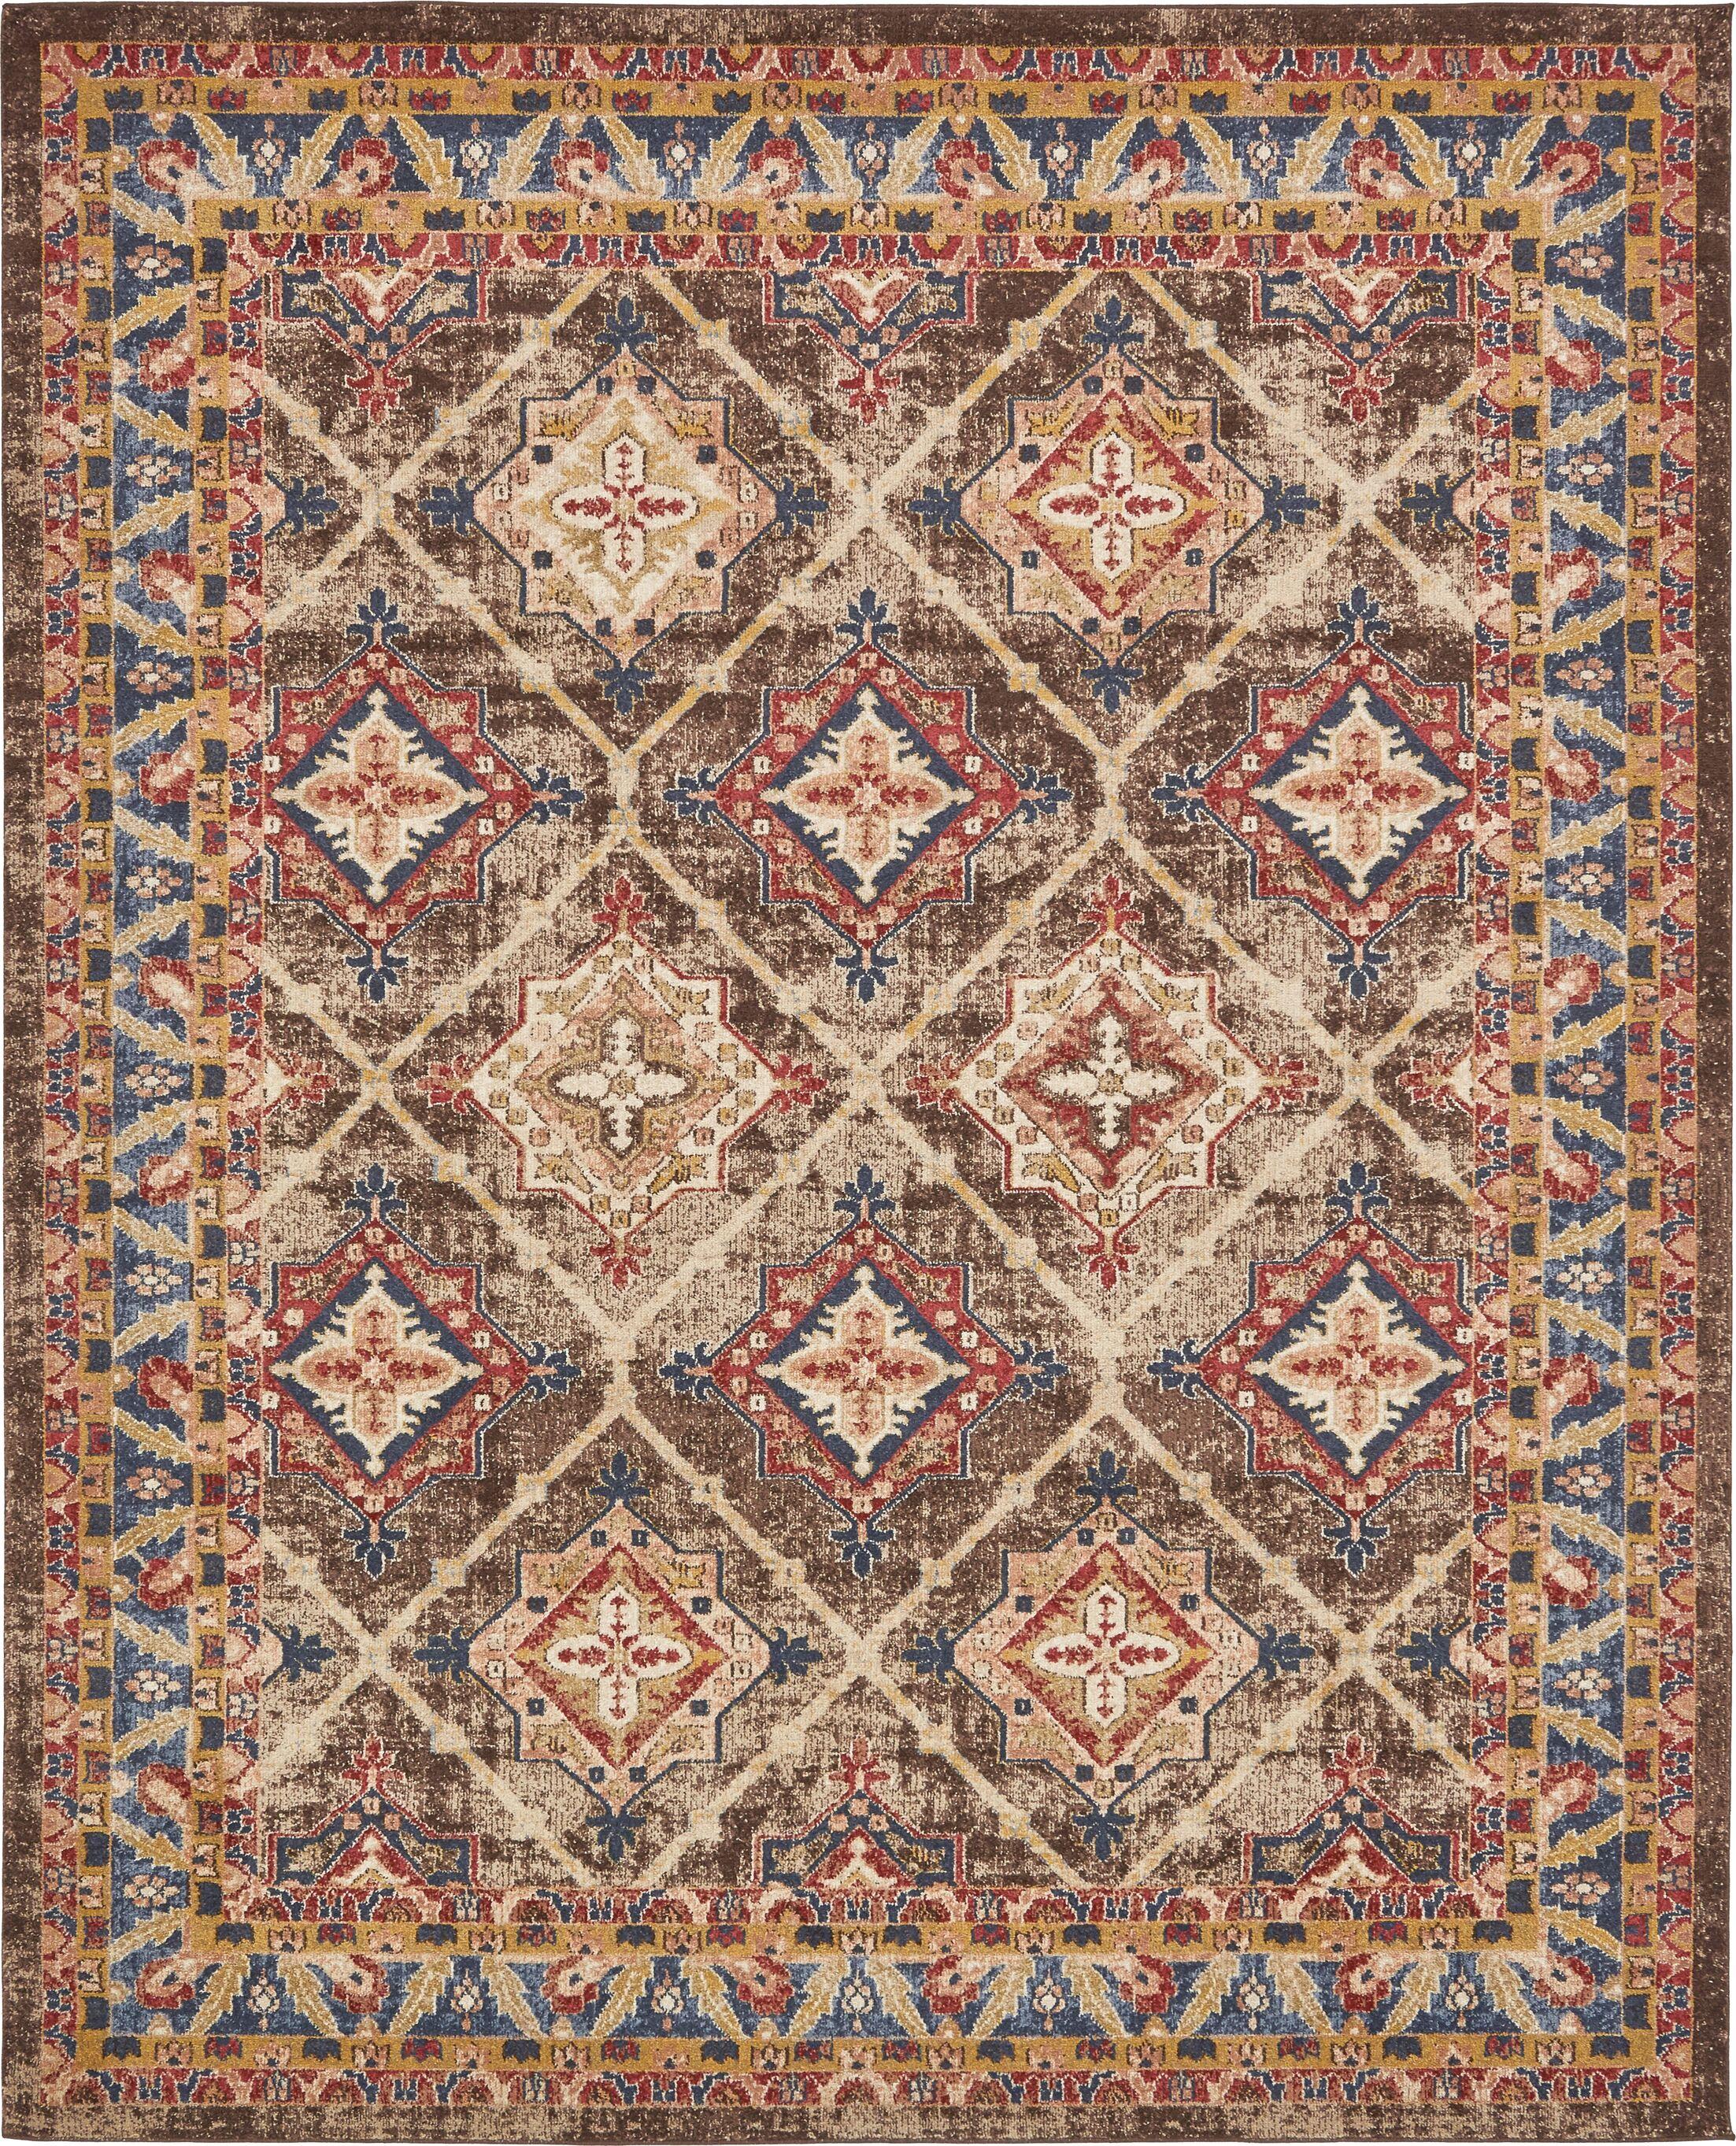 Nathanson Dark Brown Area Rug Rug Size: Rectangle 8' x 10'